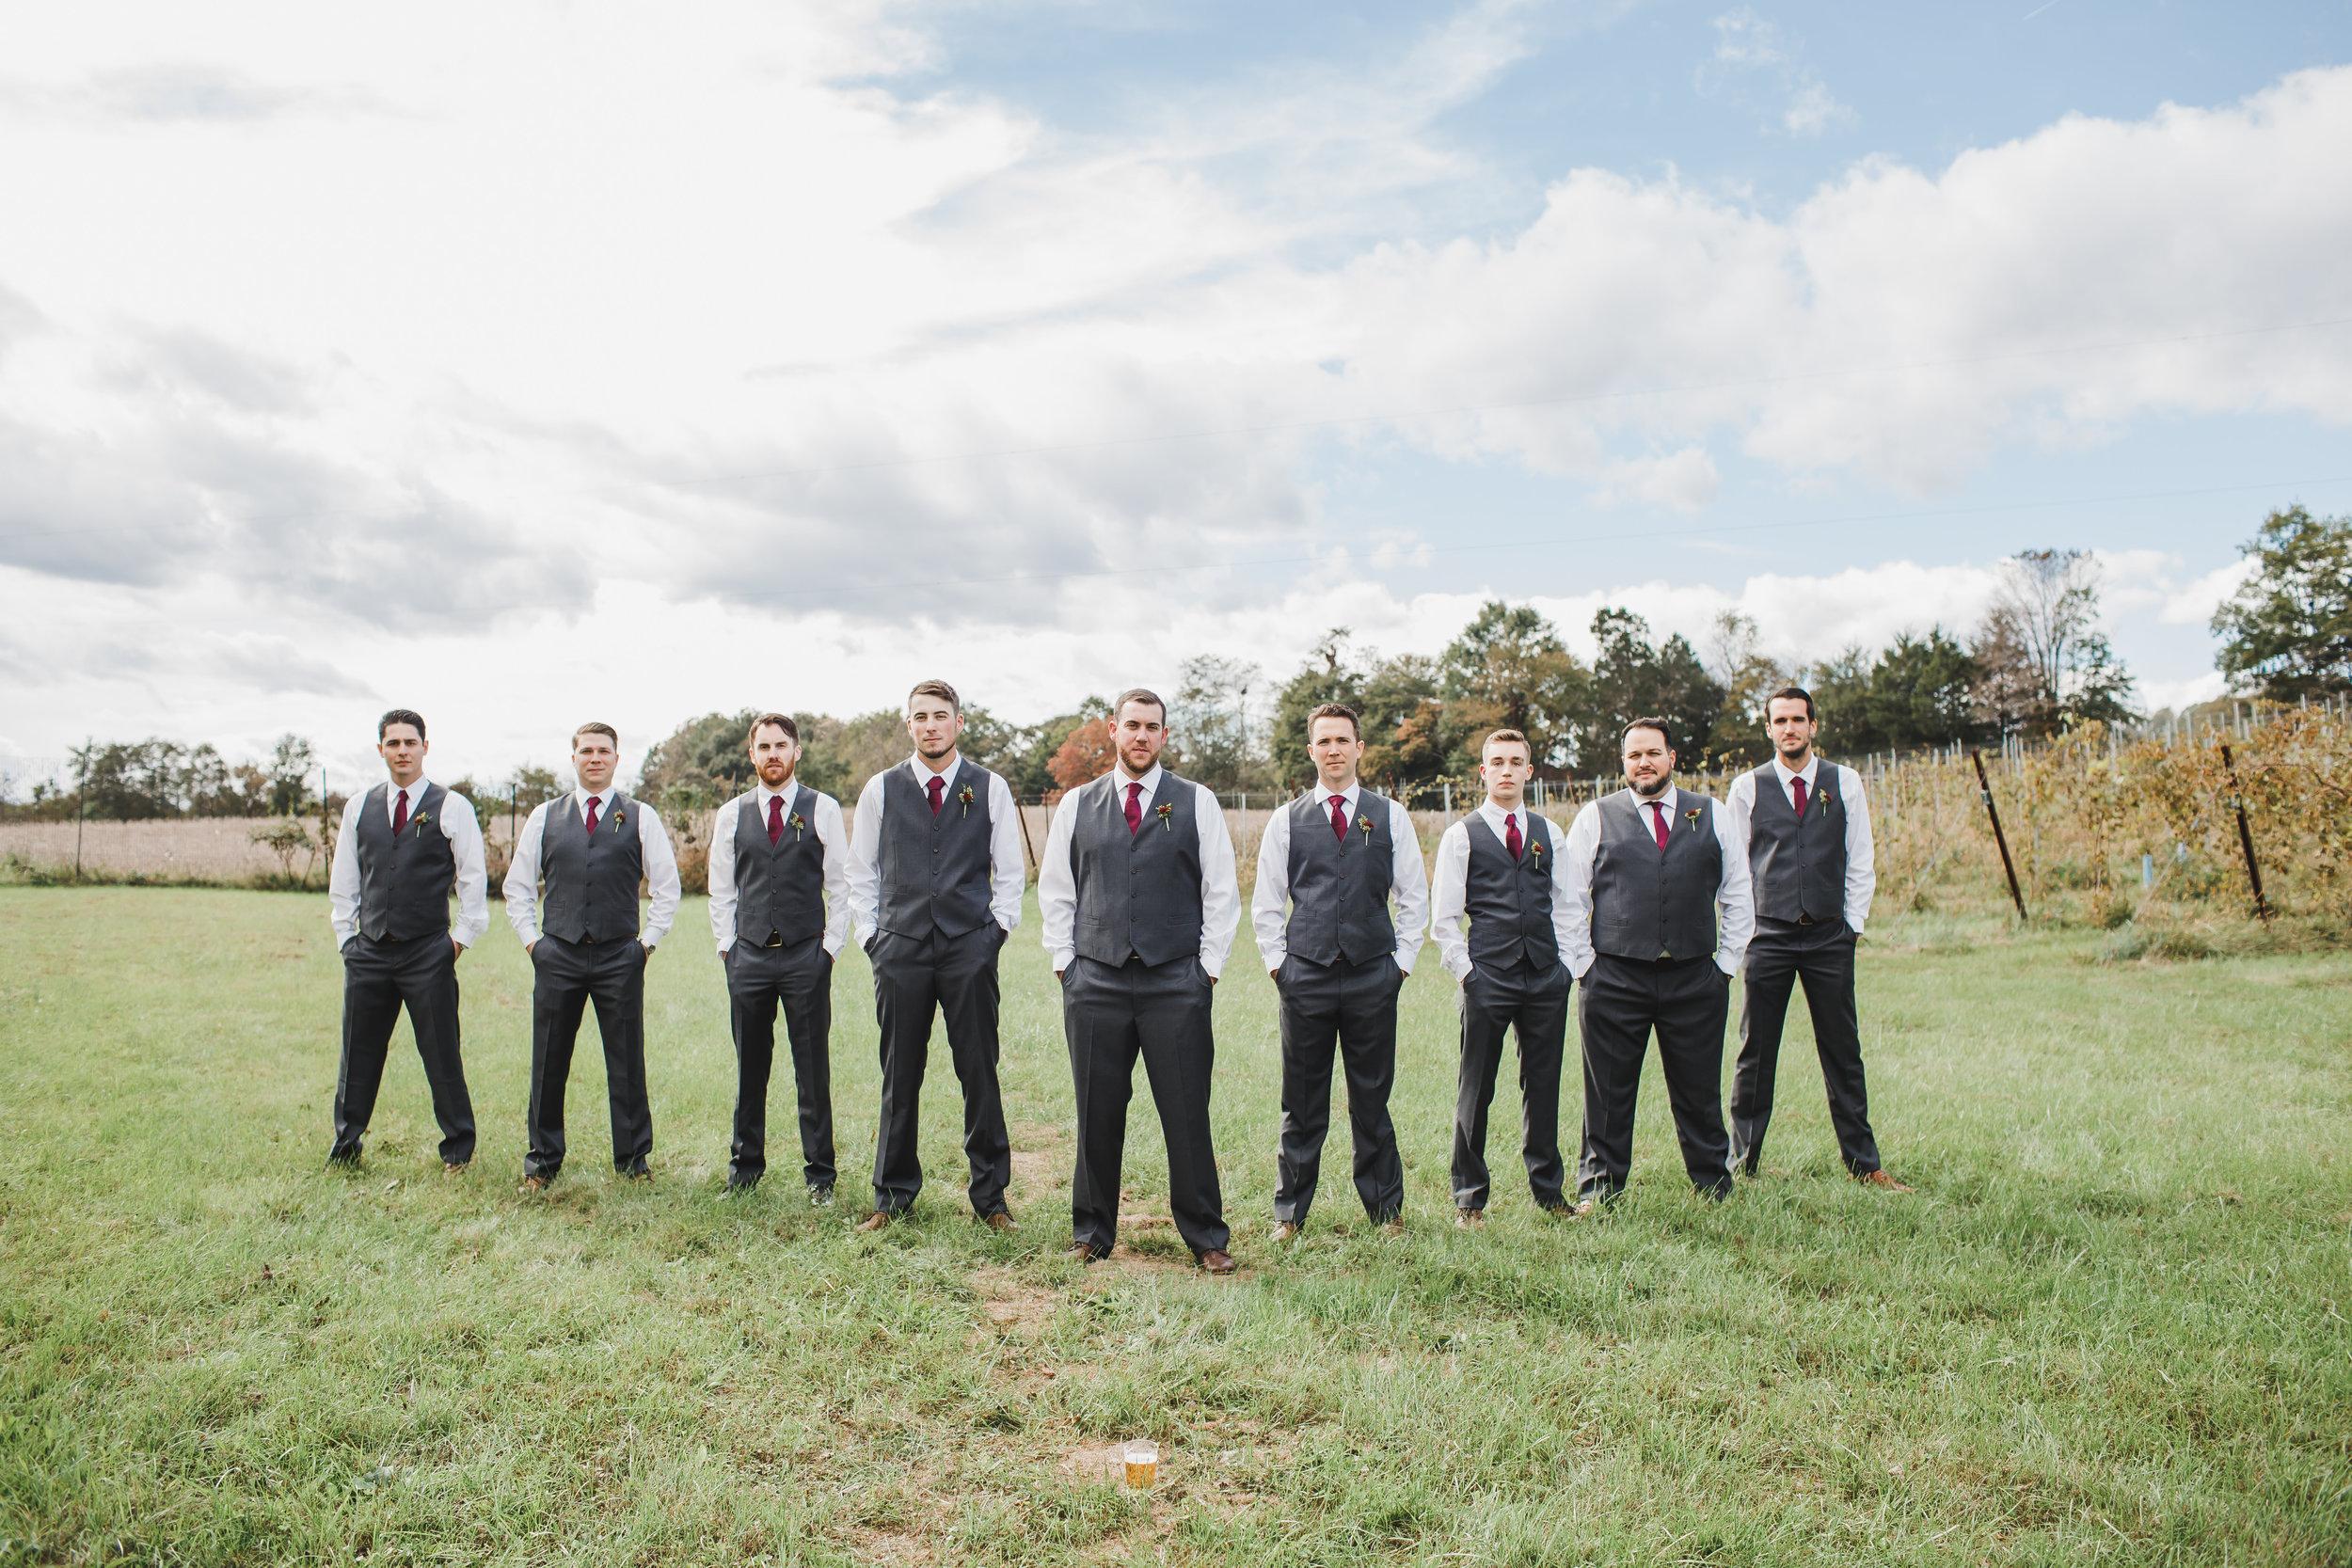 Fling - Virginia Wedding Photographer - Photography by Amy Nicole-389-2.jpg